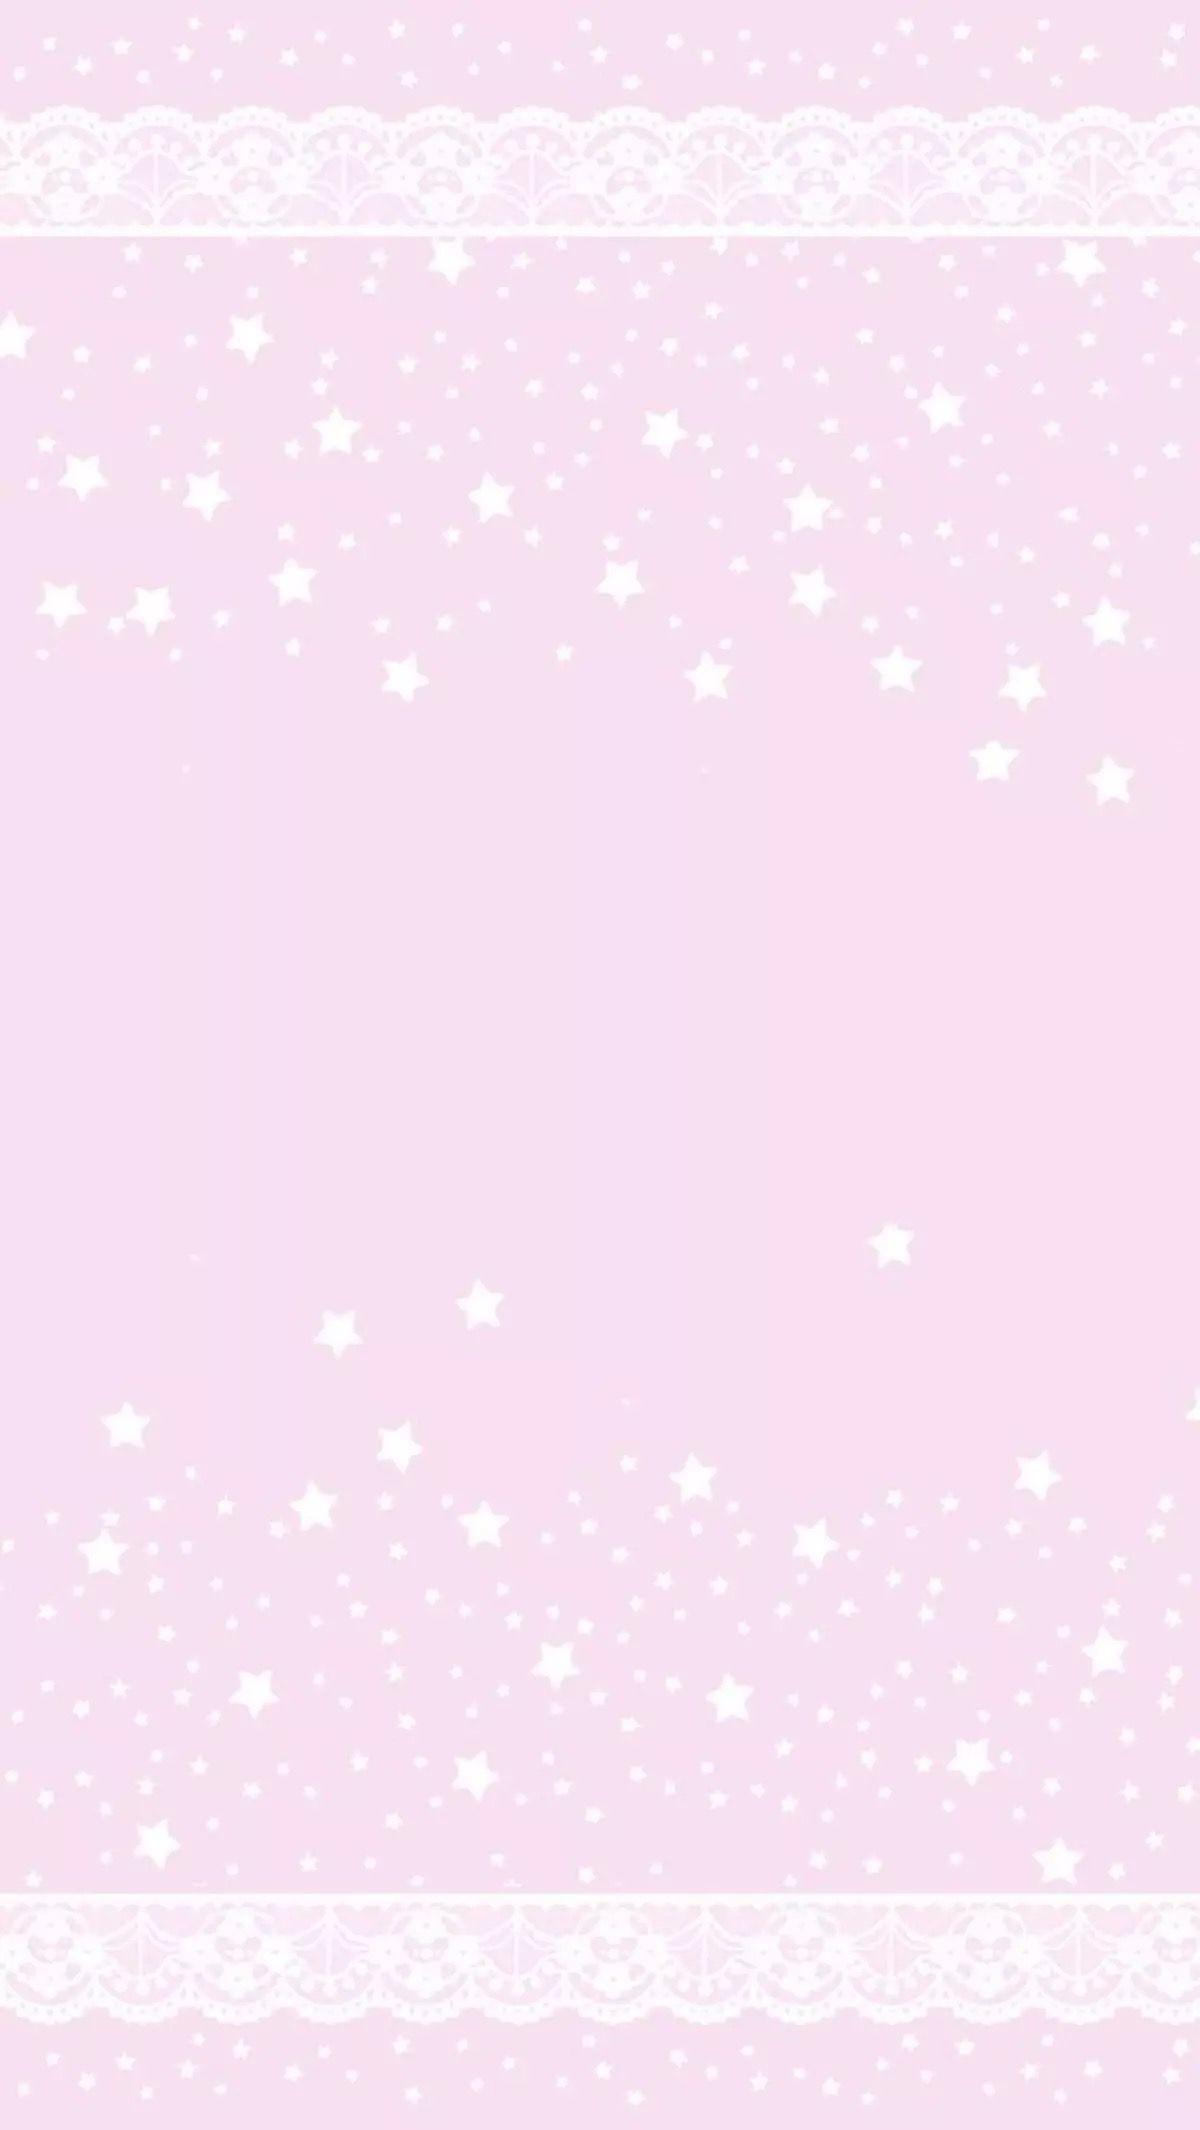 Res: 1200x2130, Kawaii Wallpaper, Pink Wallpaper, Pattern Wallpaper, Mobile Wallpaper, Wallpaper  Backgrounds, Iphone Wallpapers, Kawaii Art, Pattern Art, Bg Pastel